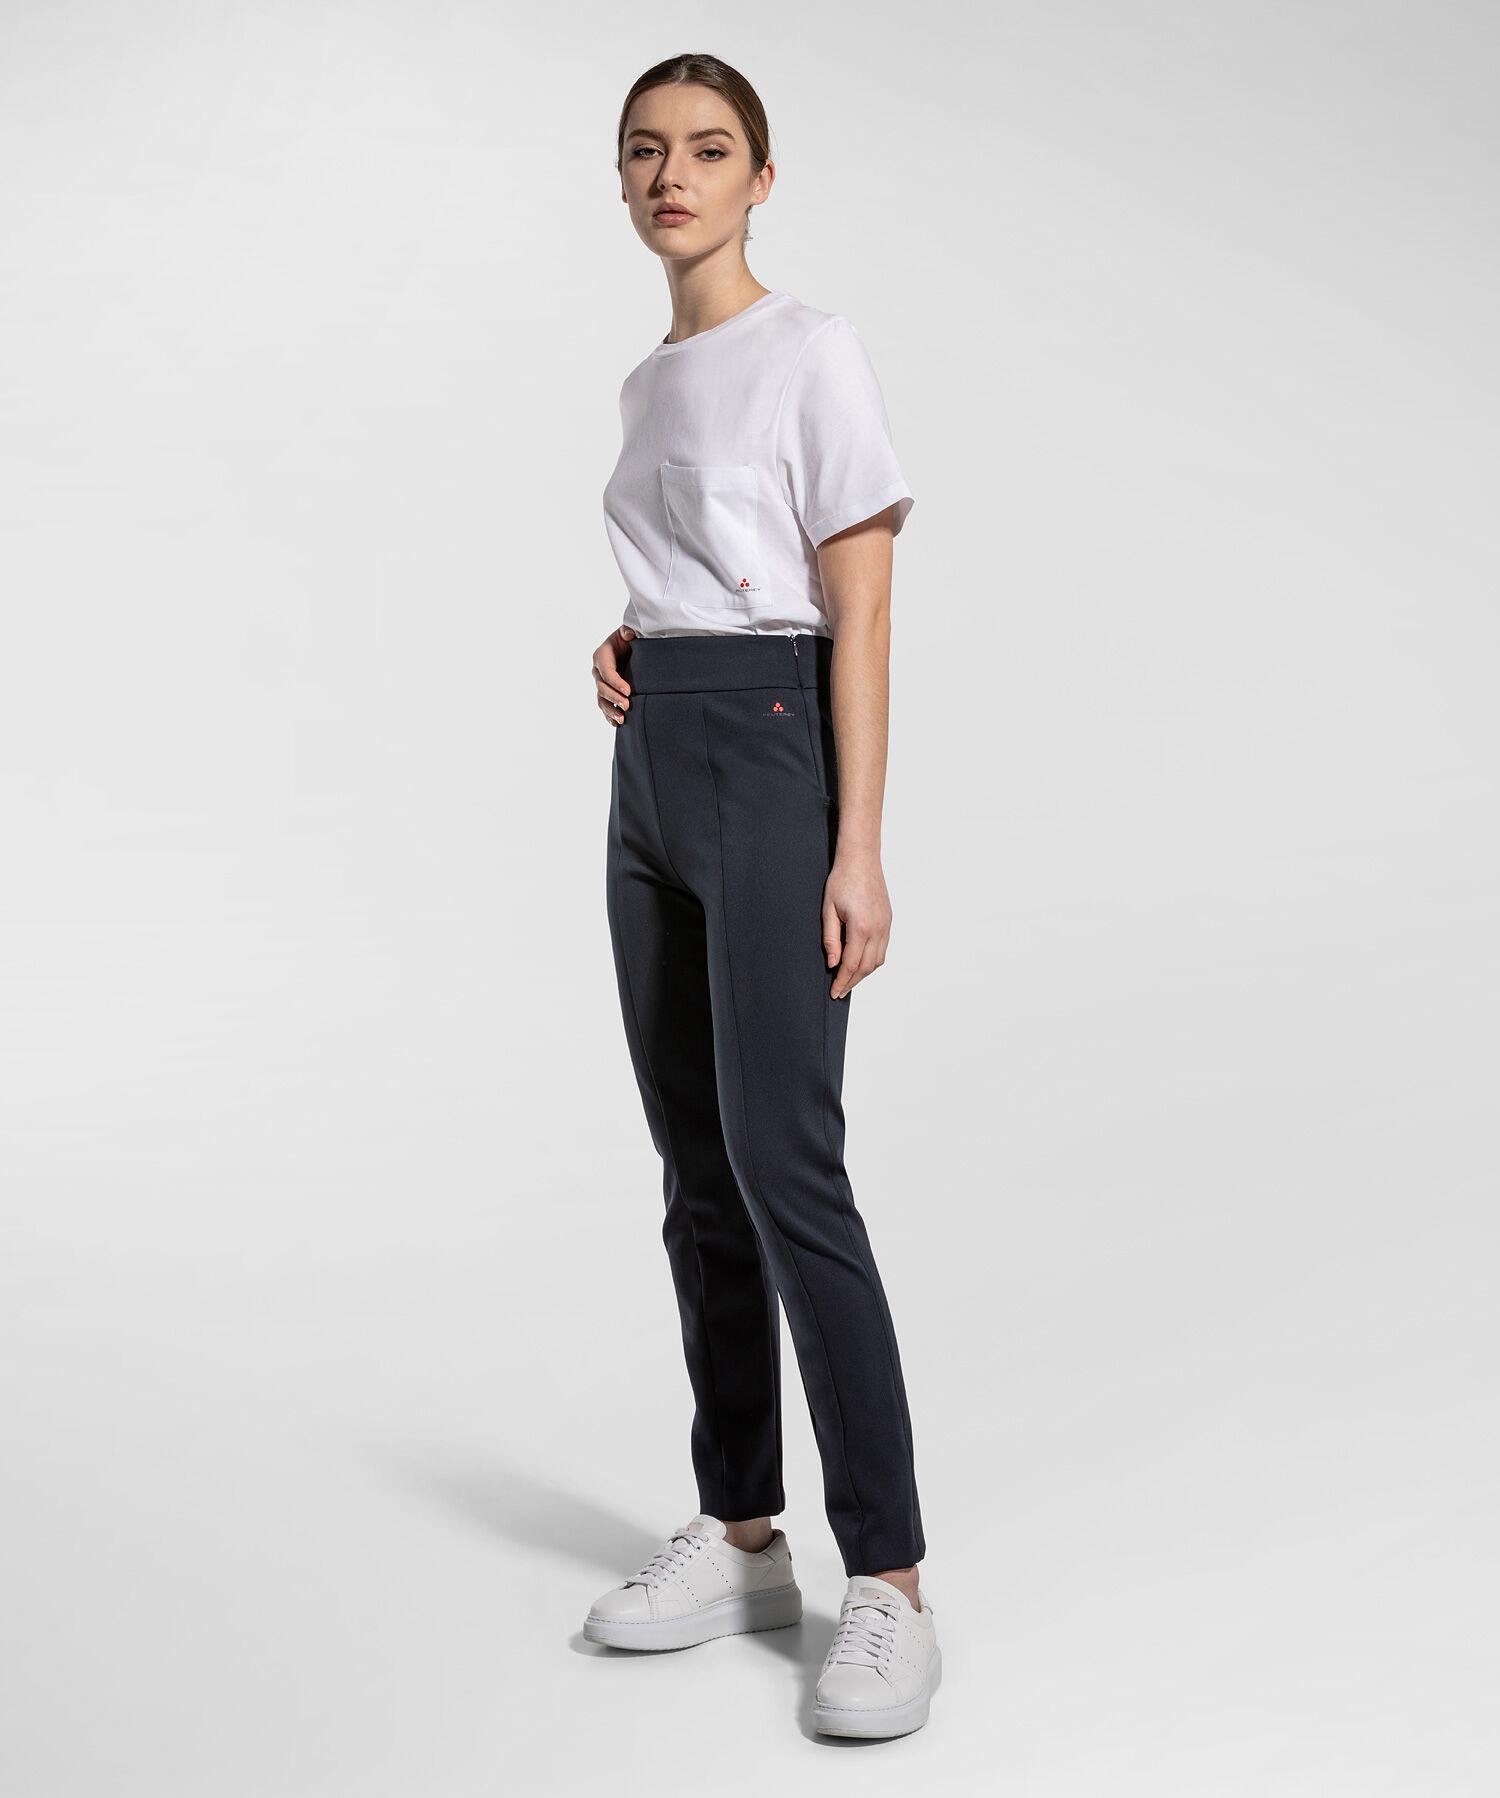 Pantaloni Slim In Tessuto Tecnico - Peuterey